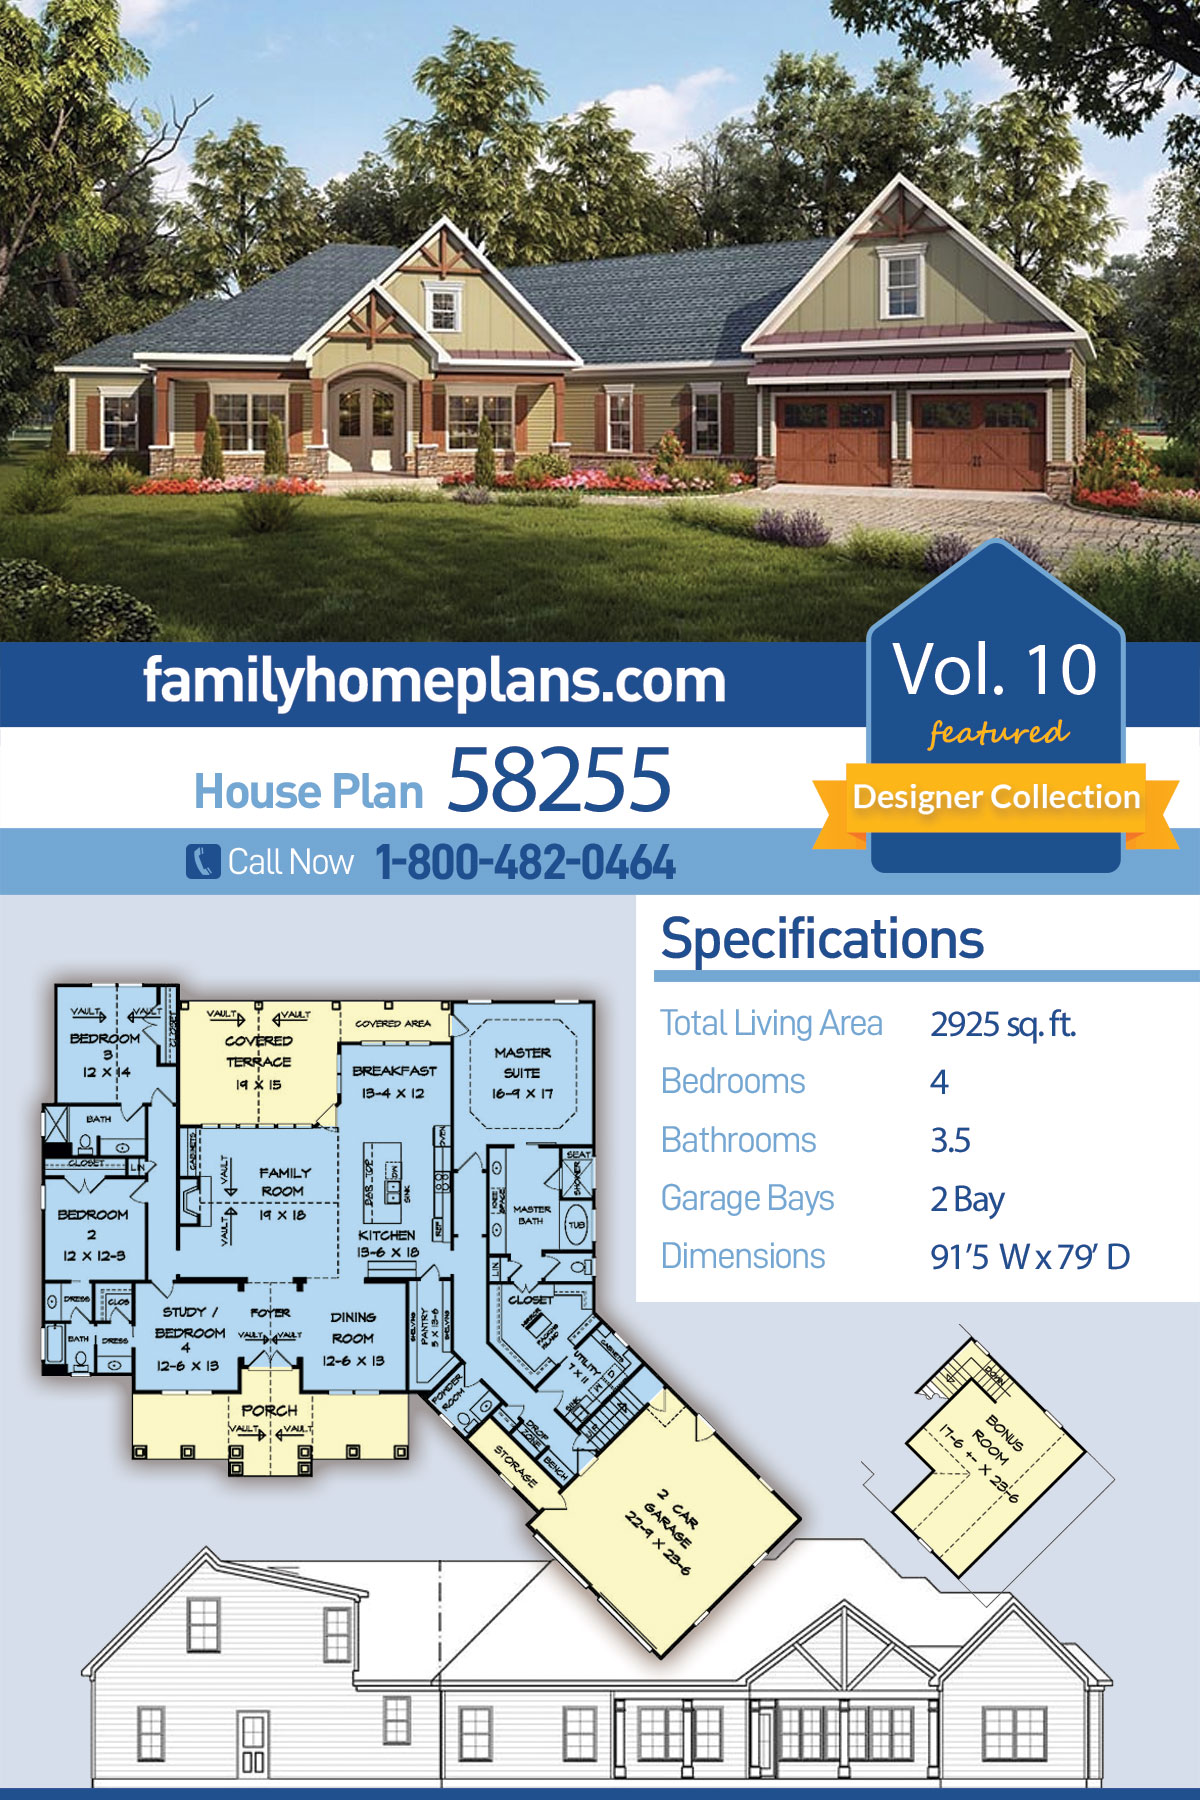 Craftsman House Plan 58255 with 4 Beds , 4 Baths , 2 Car Garage